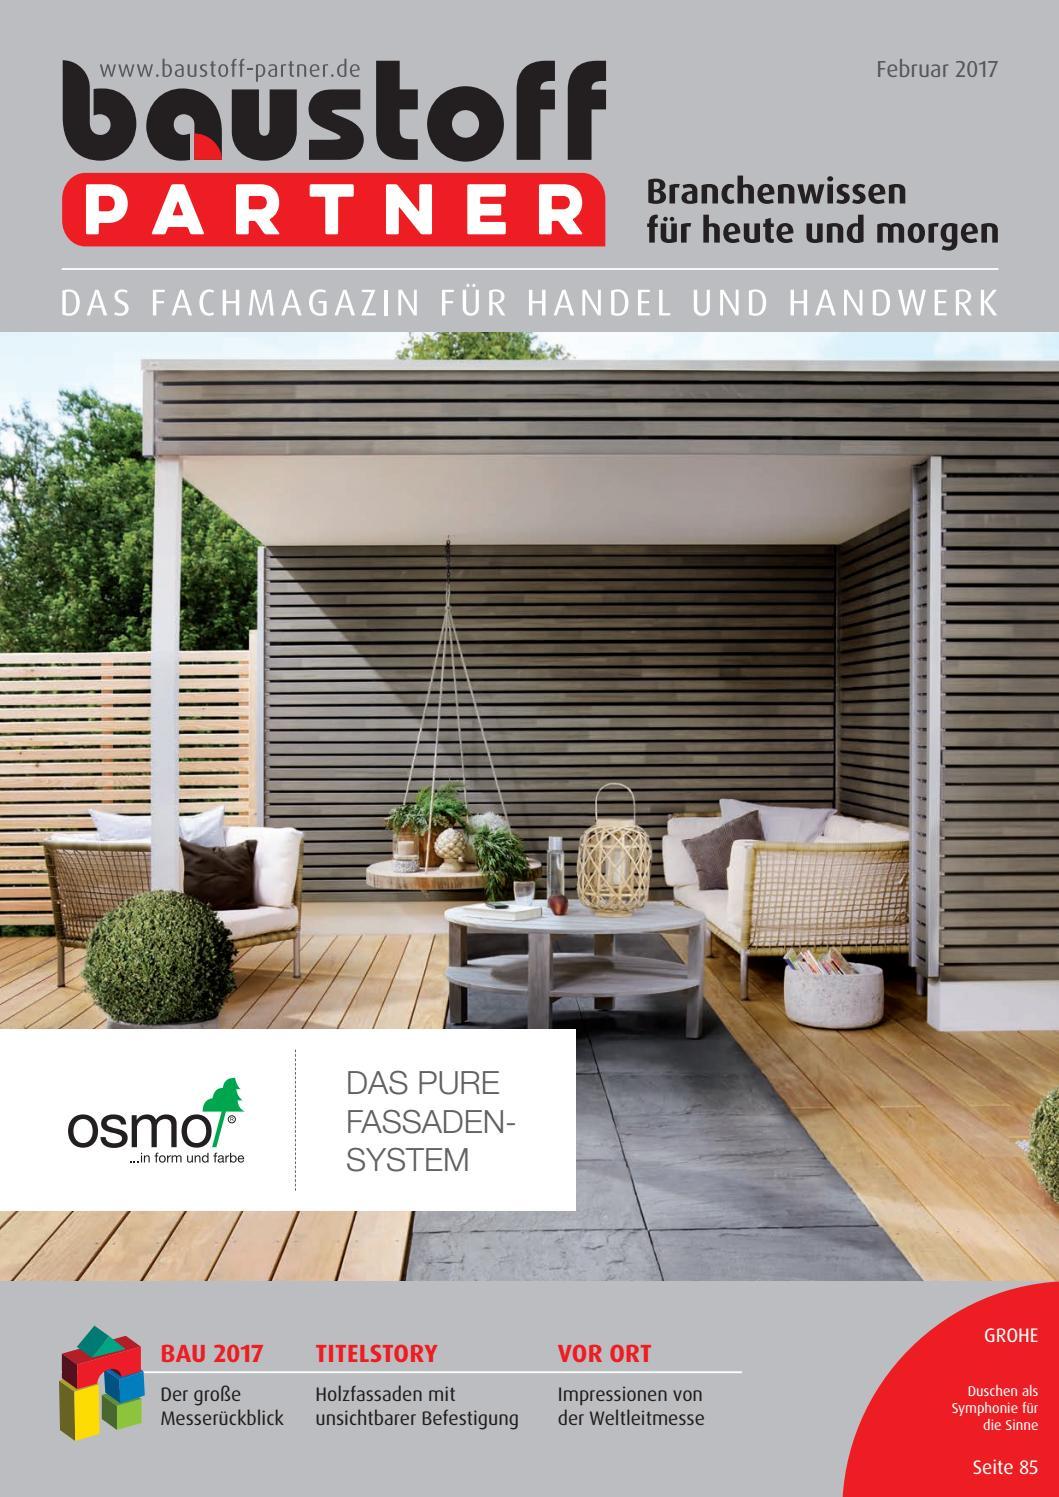 baustoffPARTNER Februar 2017 by SBM Verlag GmbH - issuu